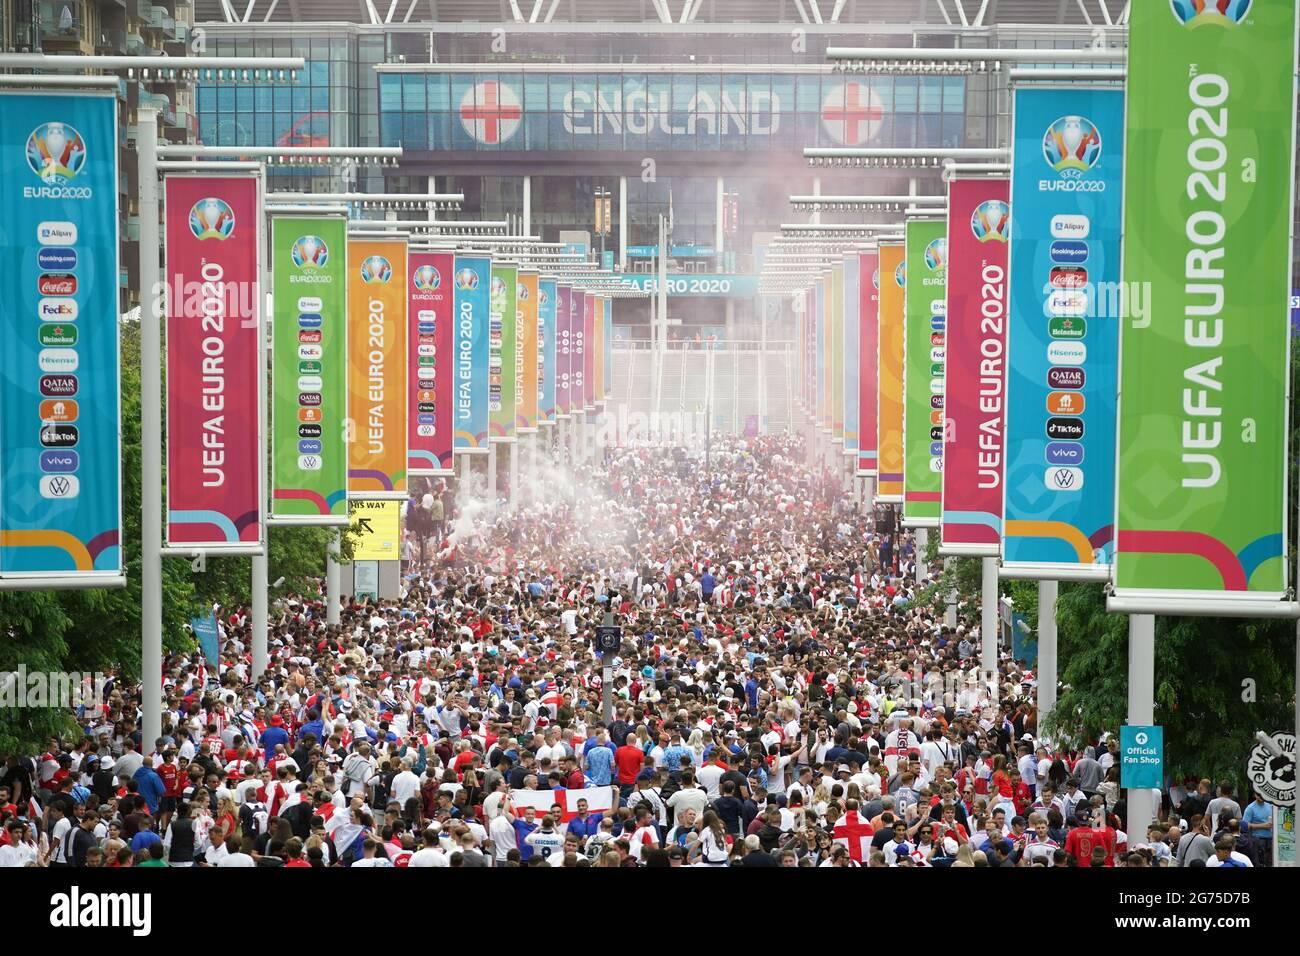 England-Fans entlang Wembley weit vor dem UEFA Euro 2020 Finale im Wembley Stadium, London. Bilddatum: Sonntag, 11. Juli 2021. Stockfoto